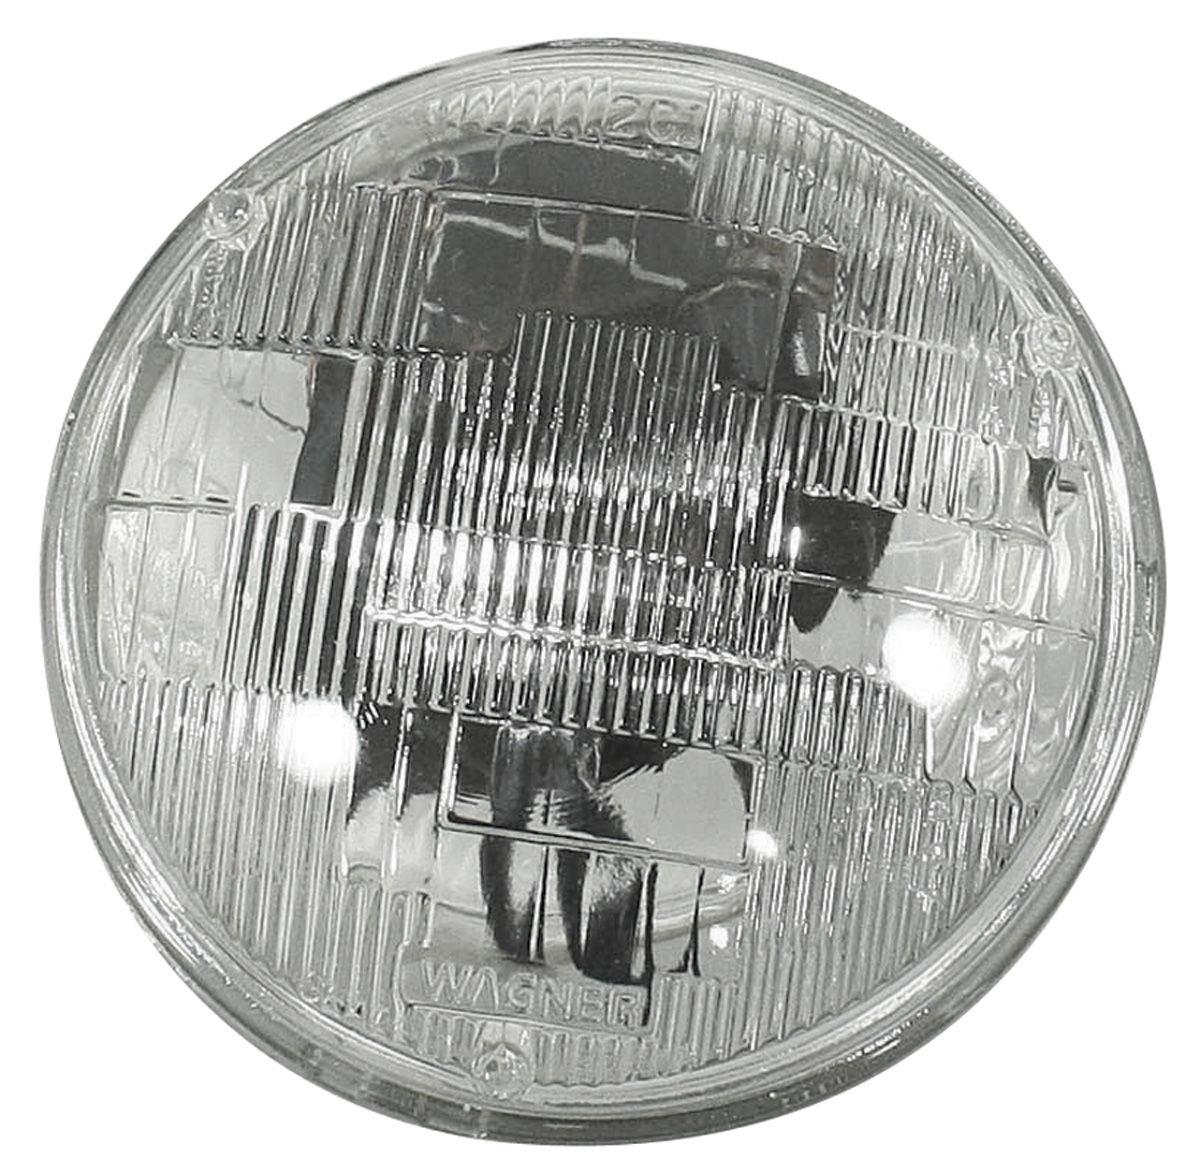 Headlamp, 1958-74 GM, High/Low Beam, Outer